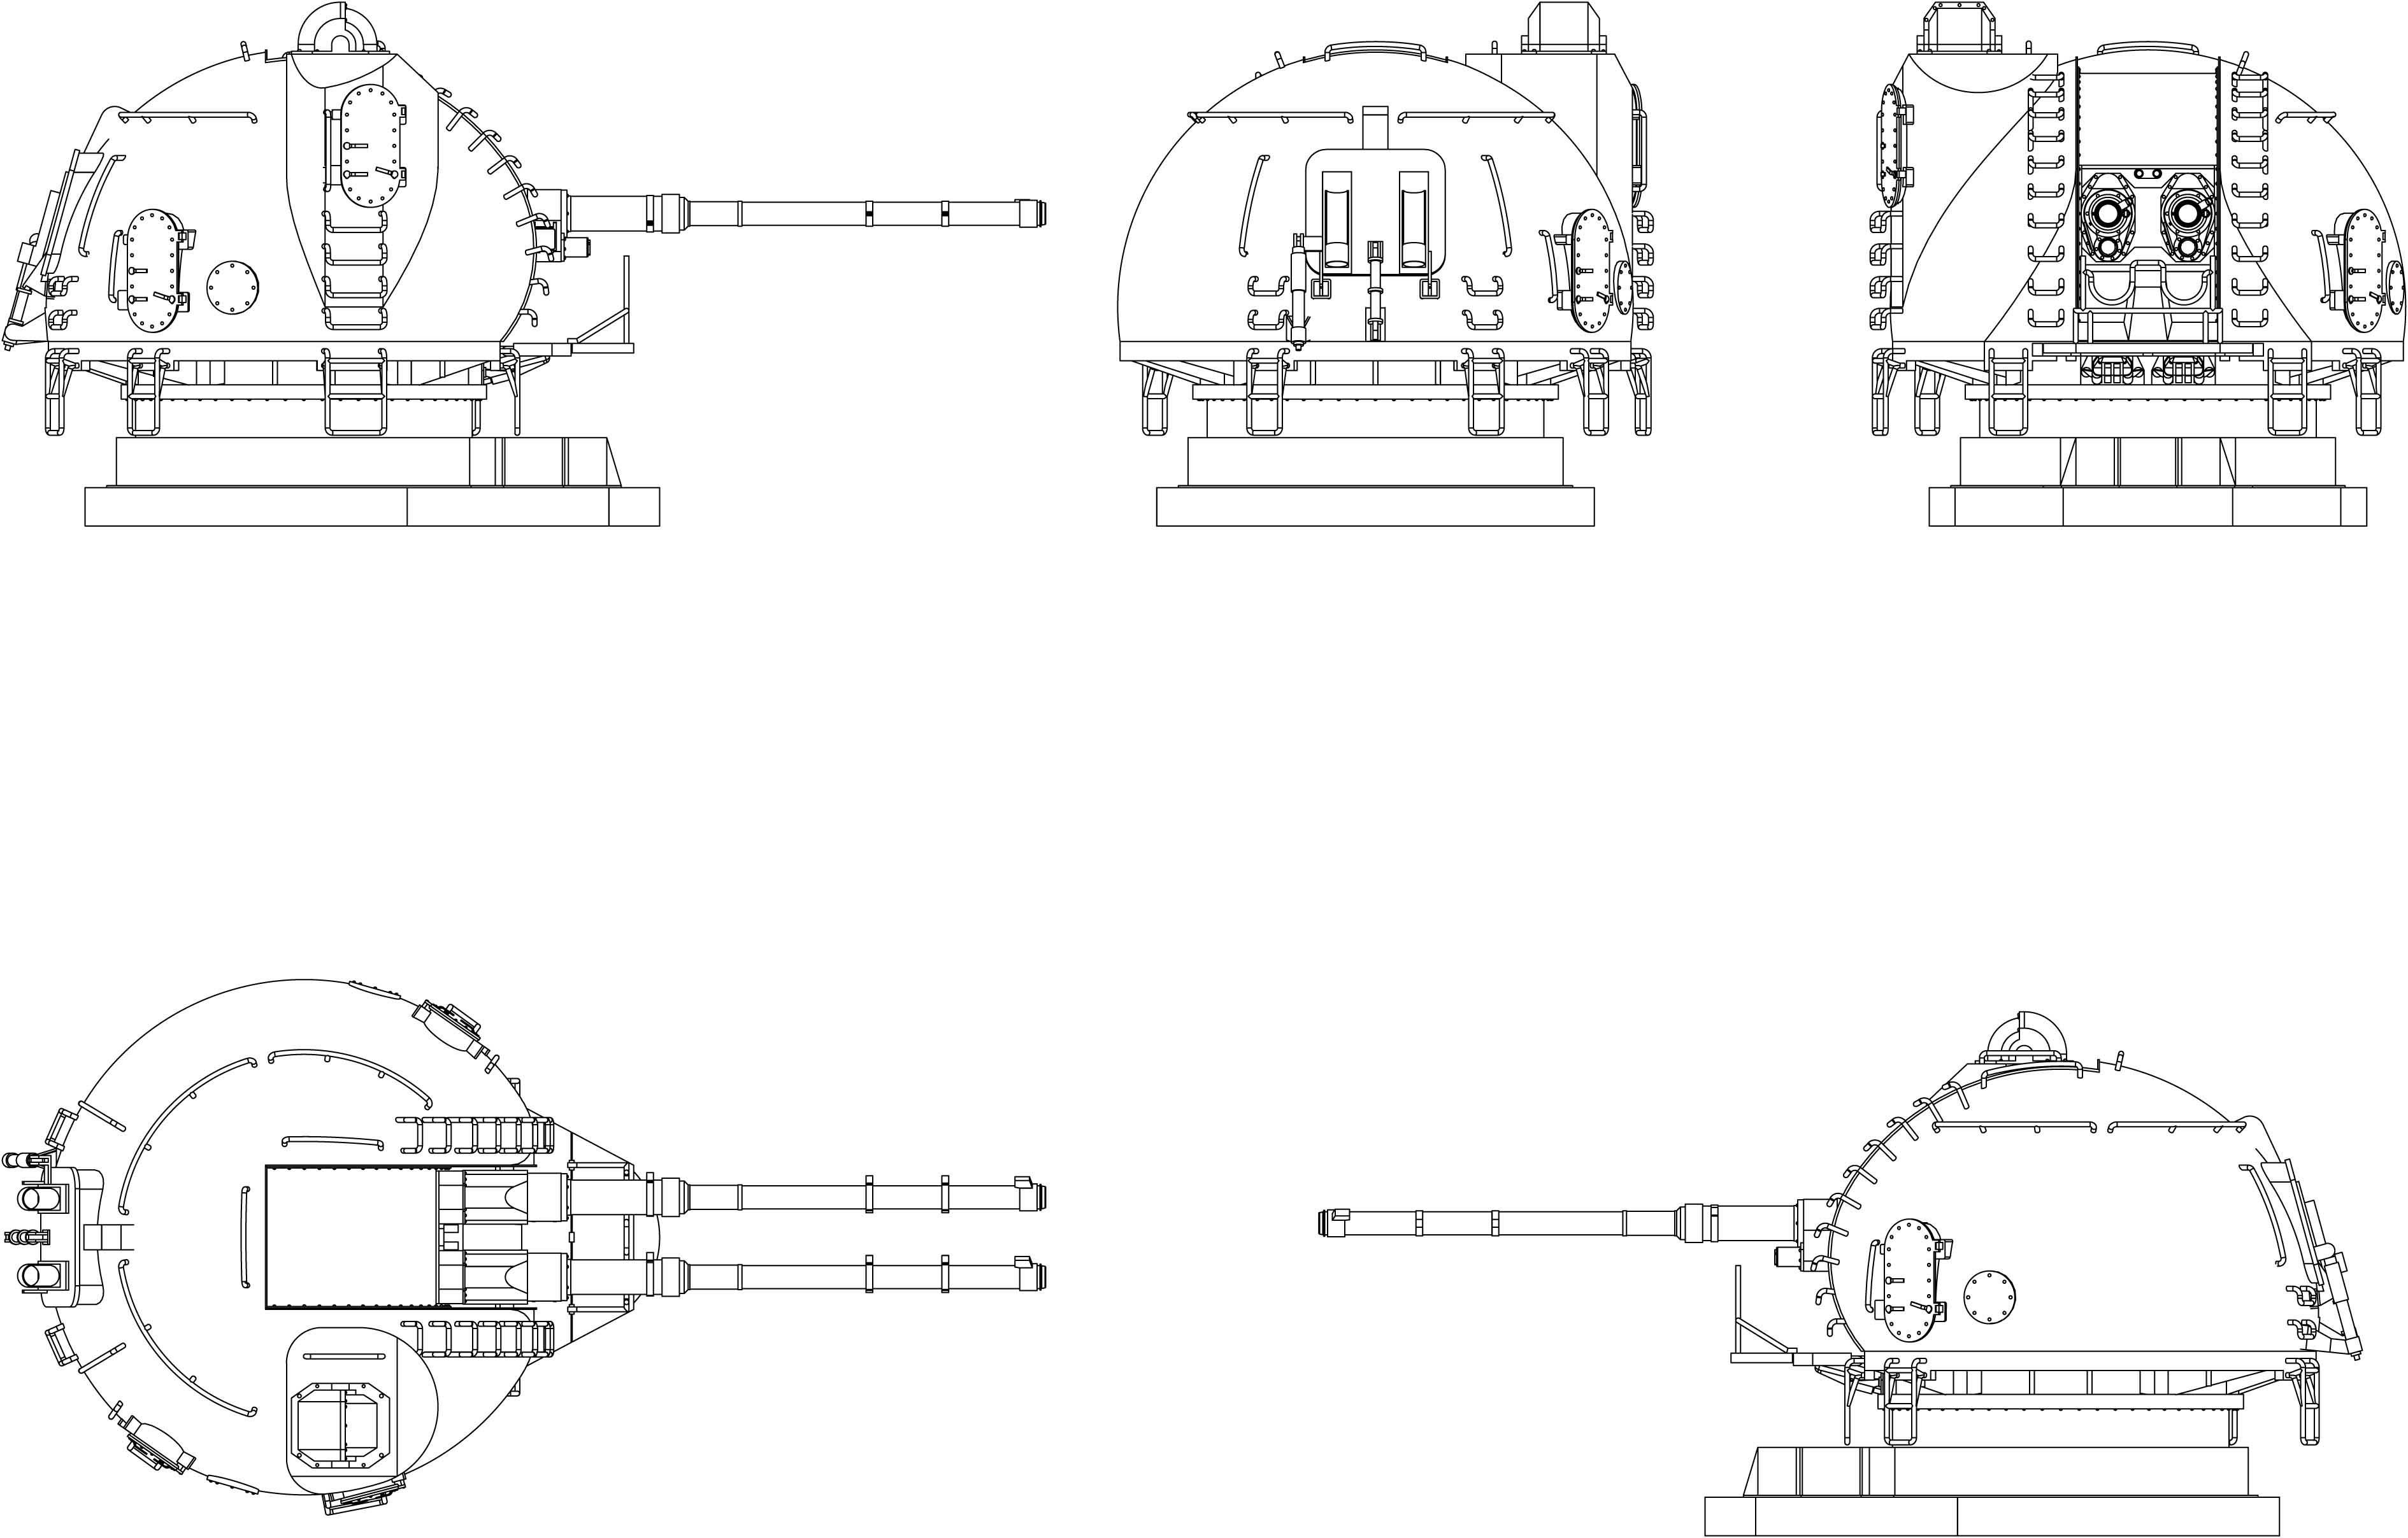 ak-130_turret_asm.jpg